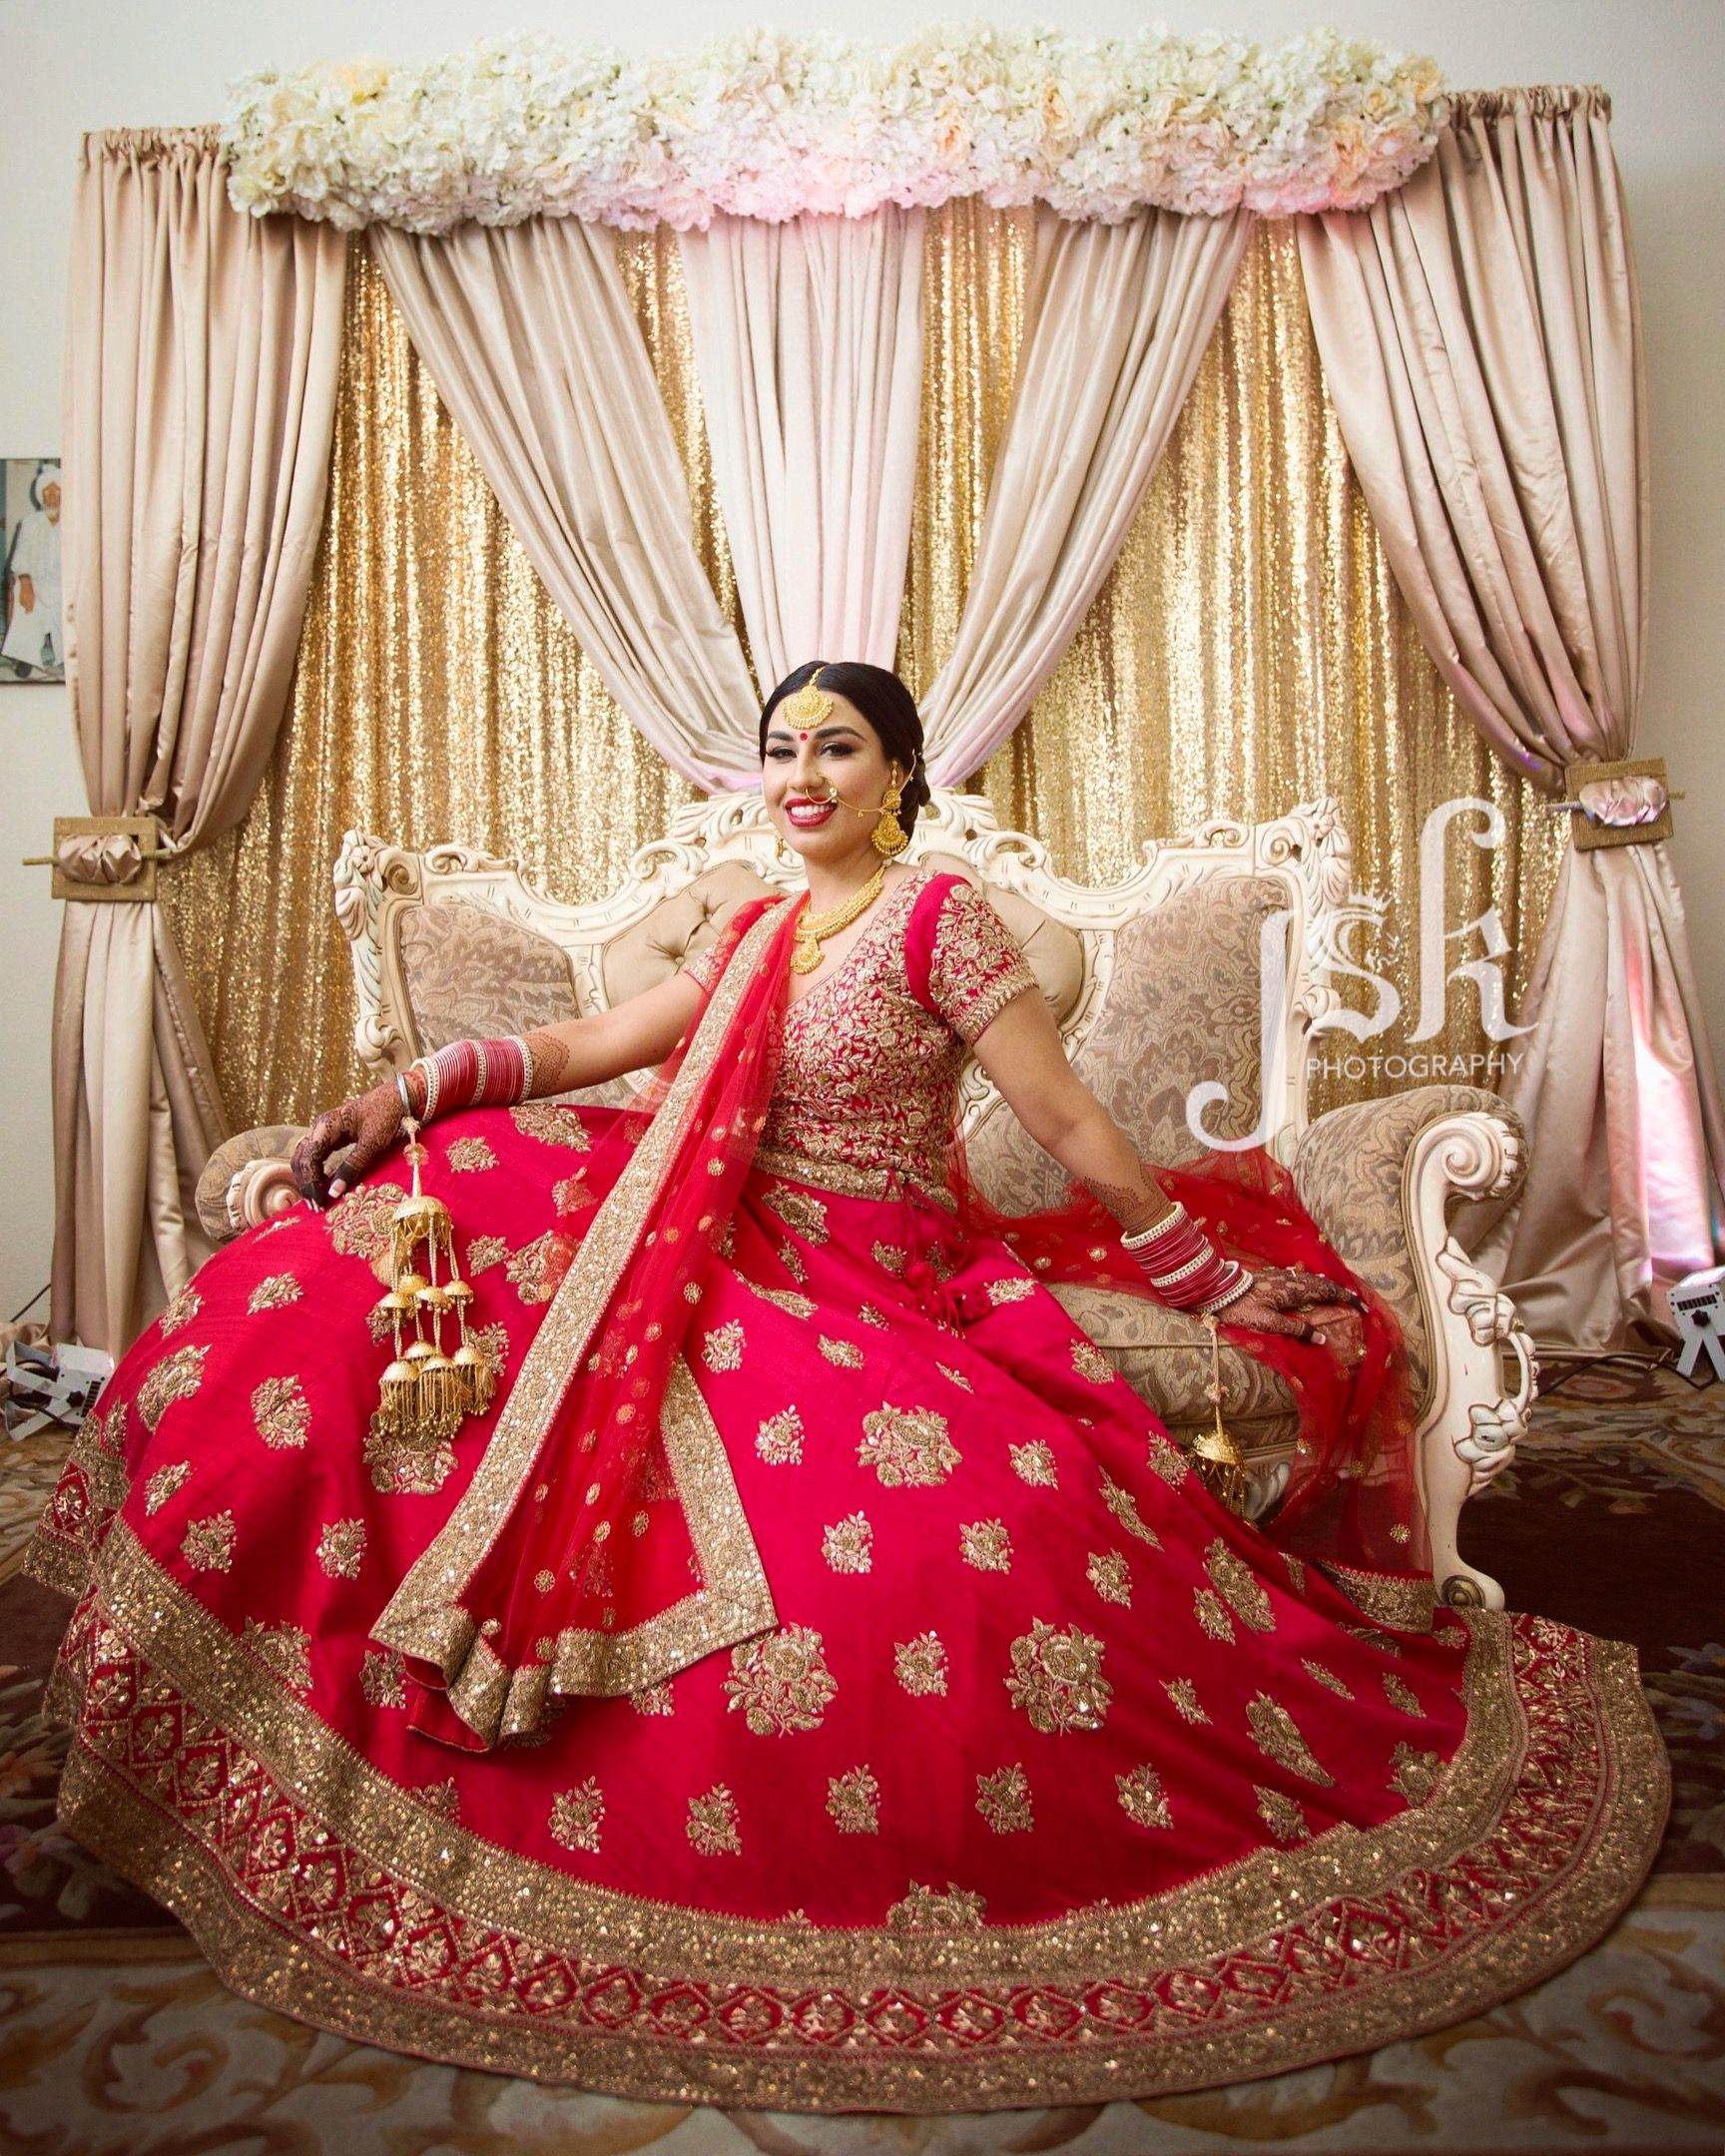 Bridal getting ready portraits cultural celebrations pinterest